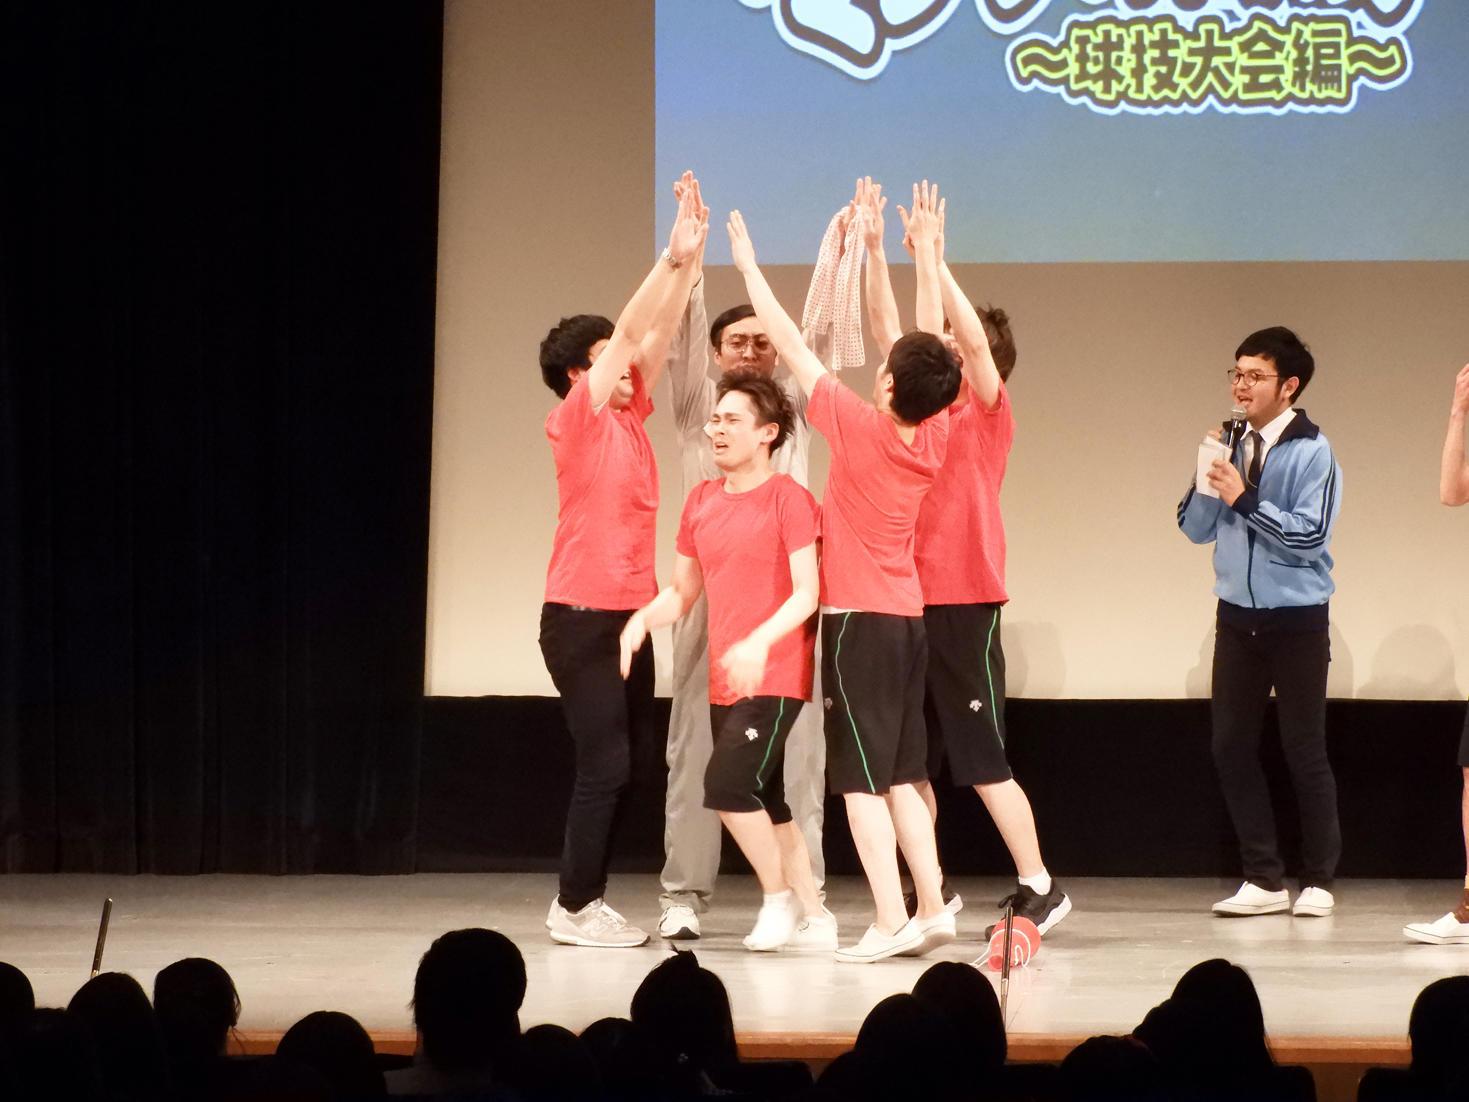 http://news.yoshimoto.co.jp/20180404104038-d6ef23fd9bf0e94914d98d60ebae480a36ca61bf.jpg